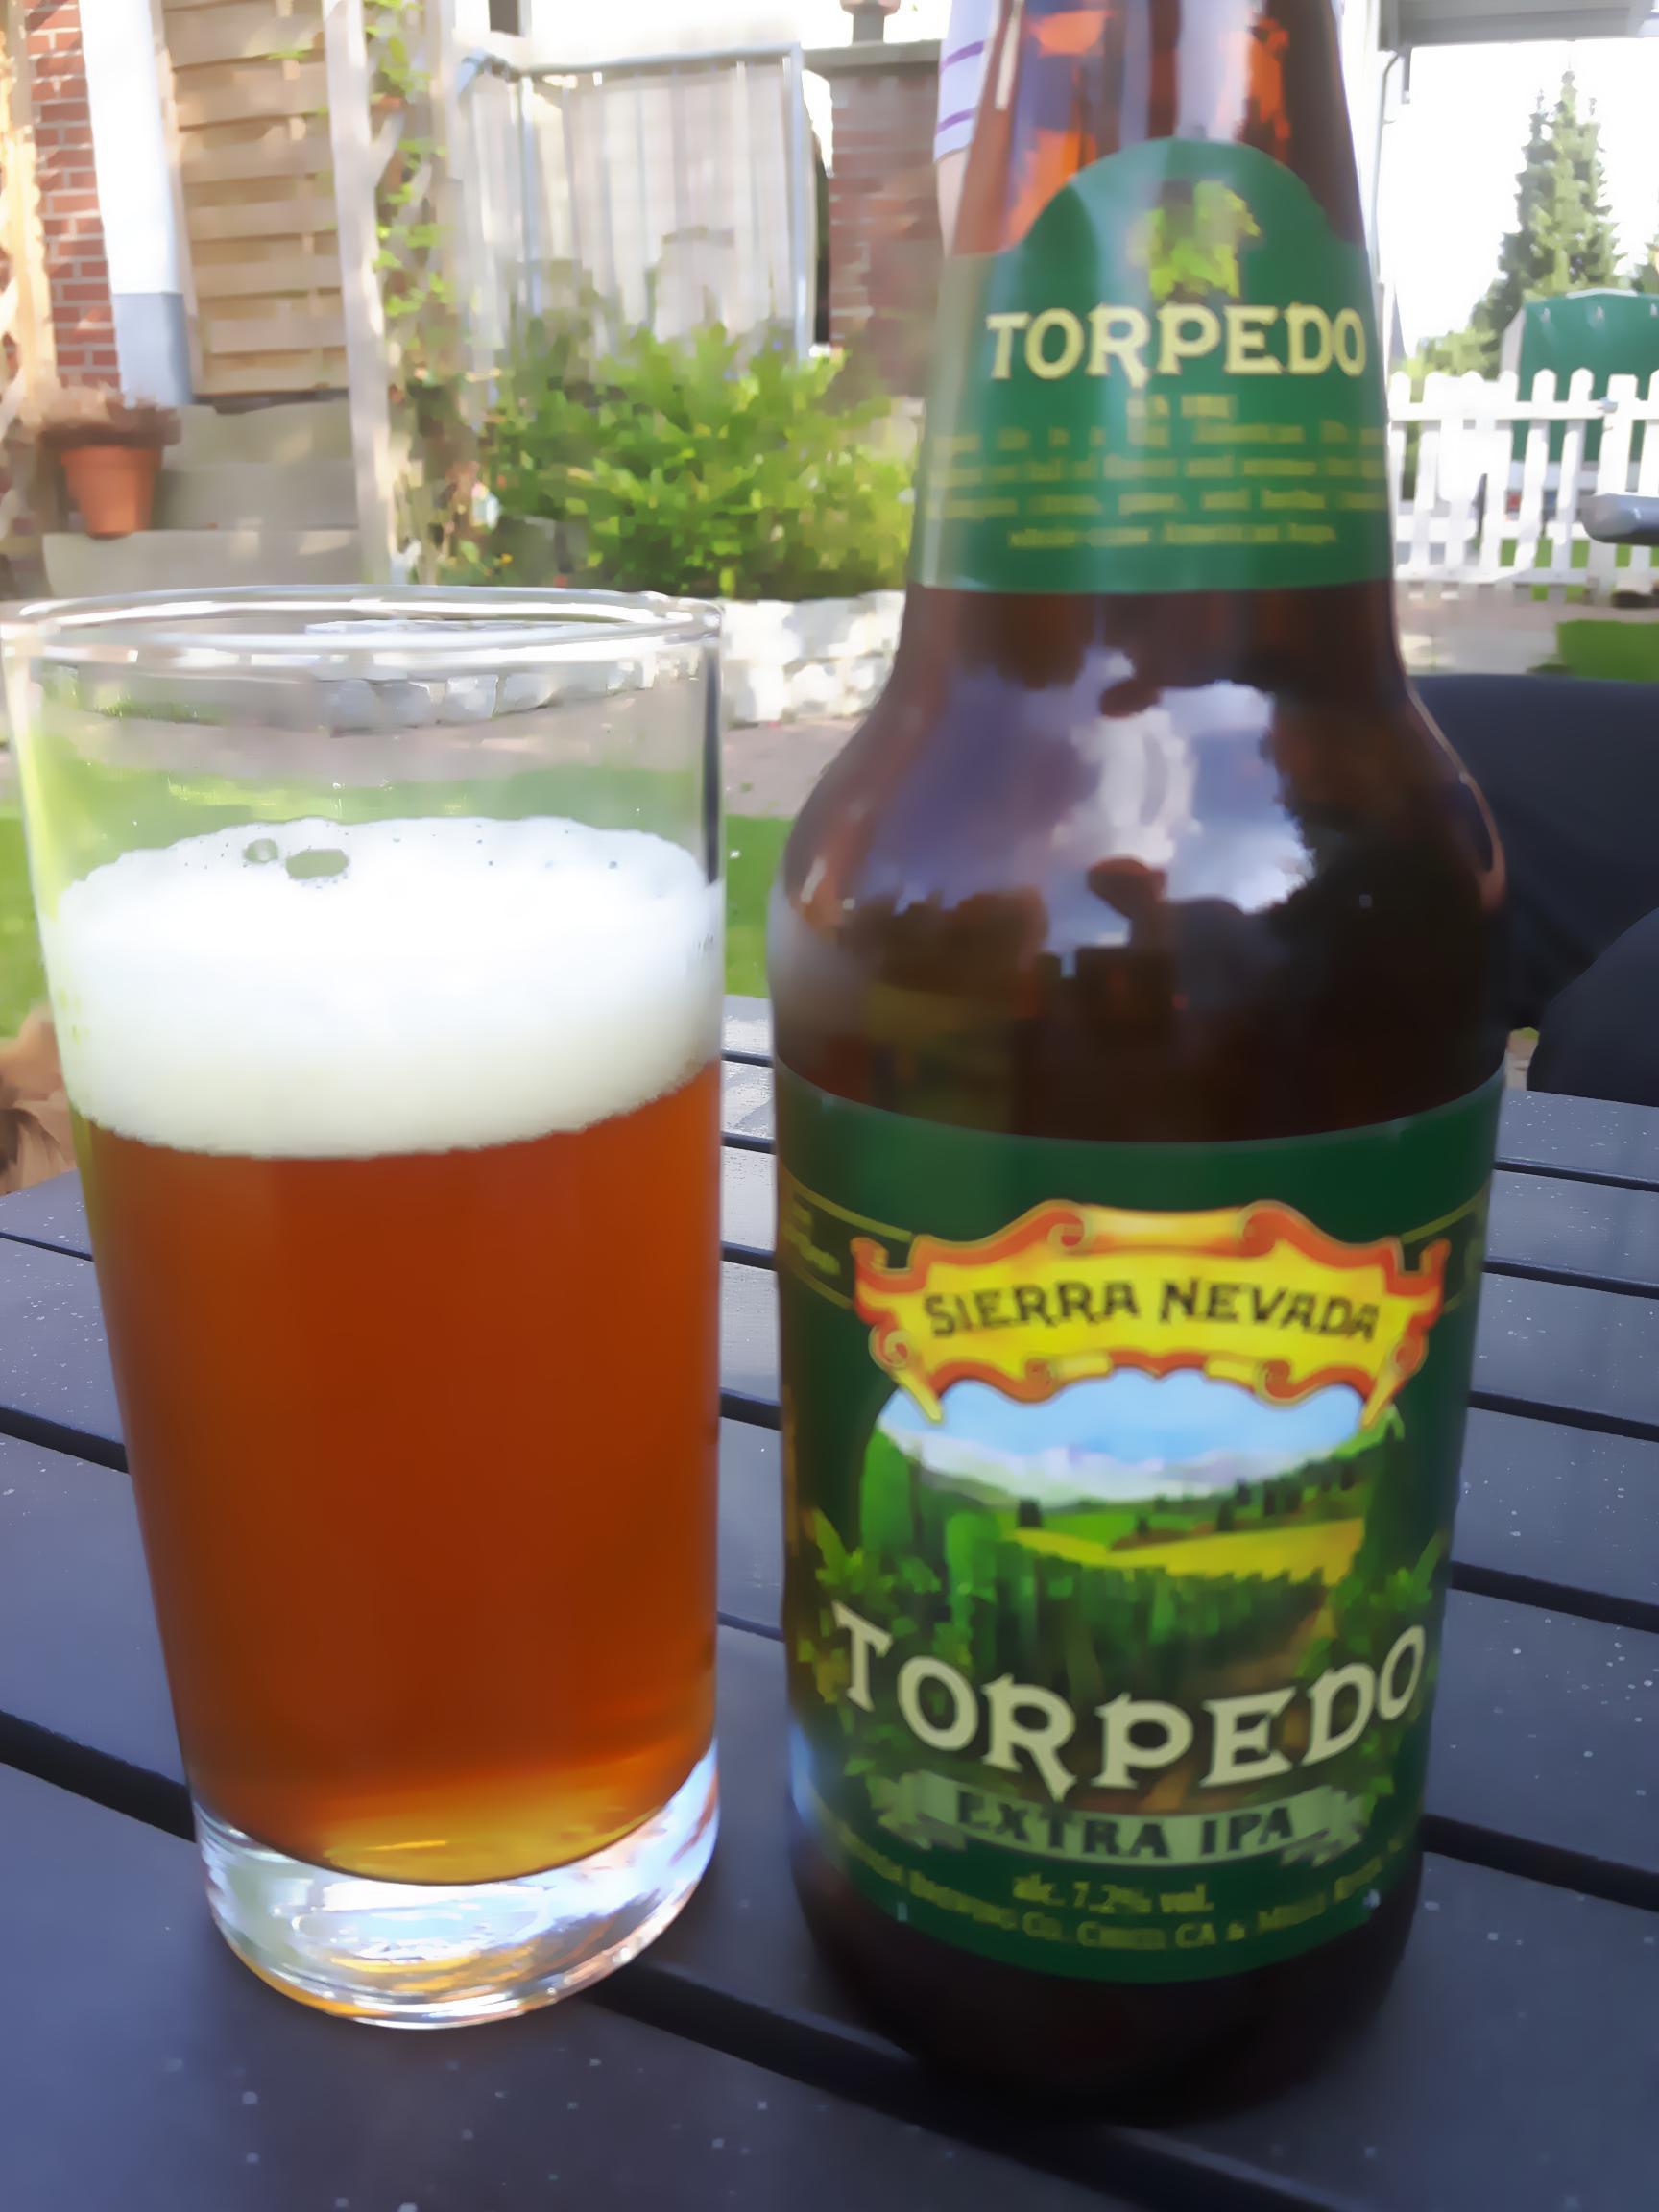 Sierra_Nevada_Torpedo